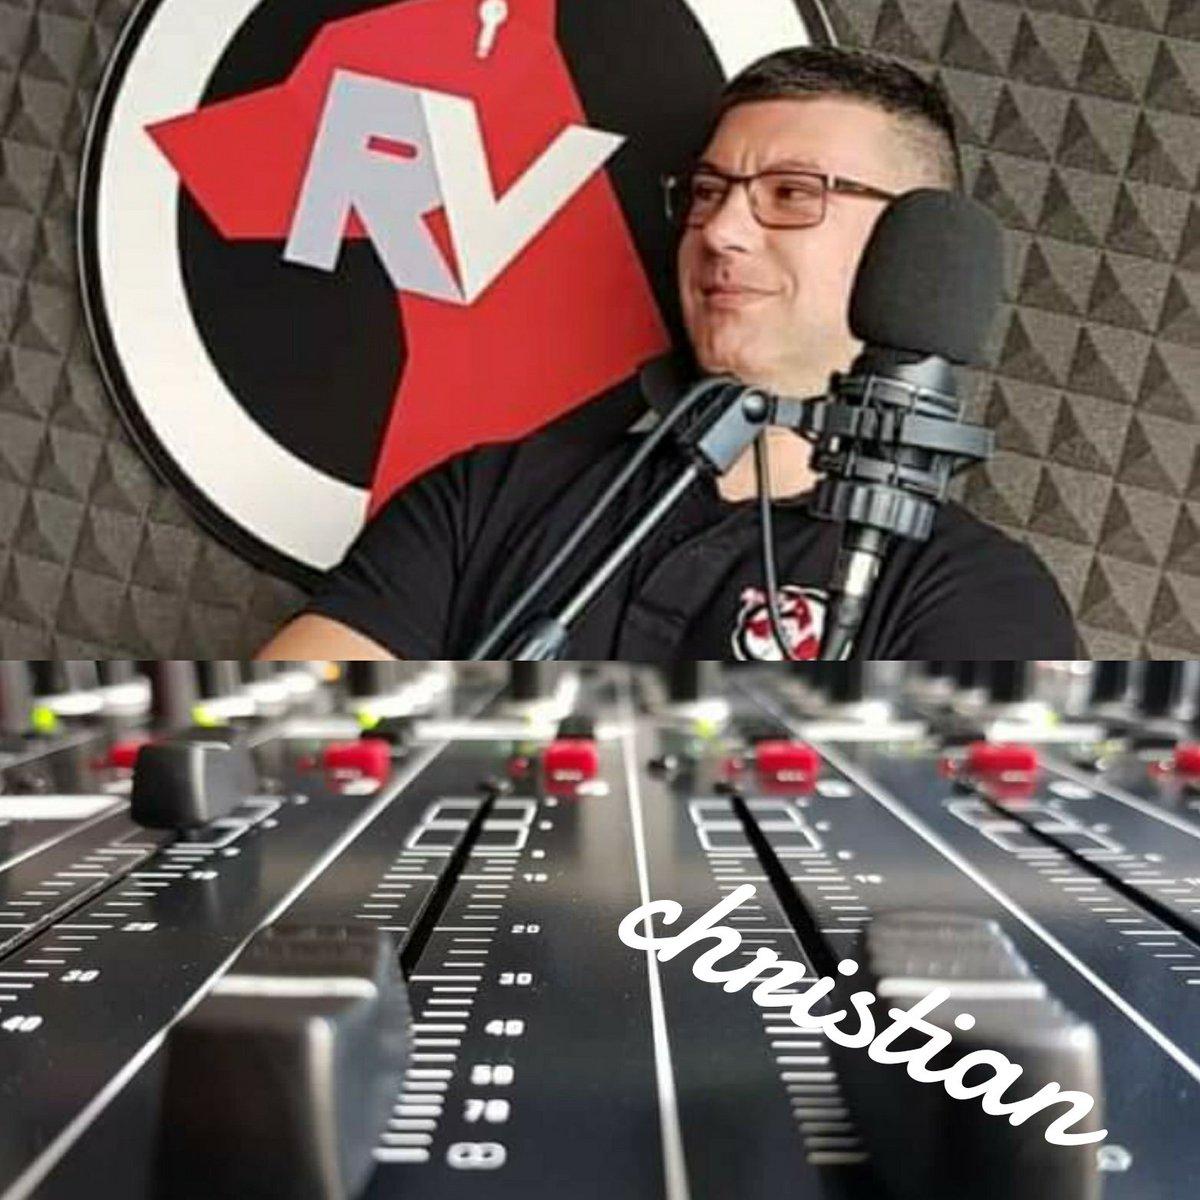 Buongiorno a tutti buona domenica  #instadj #radio #webradio #weekend #vocalist #dj #eventi #fans #vigevano #rv #radiovigevano #musica #onair #programmiradio #trance #djset #partytime #dance #speaker #house #solobellamusica #instadjs #followme #followmypage #prada #prada365